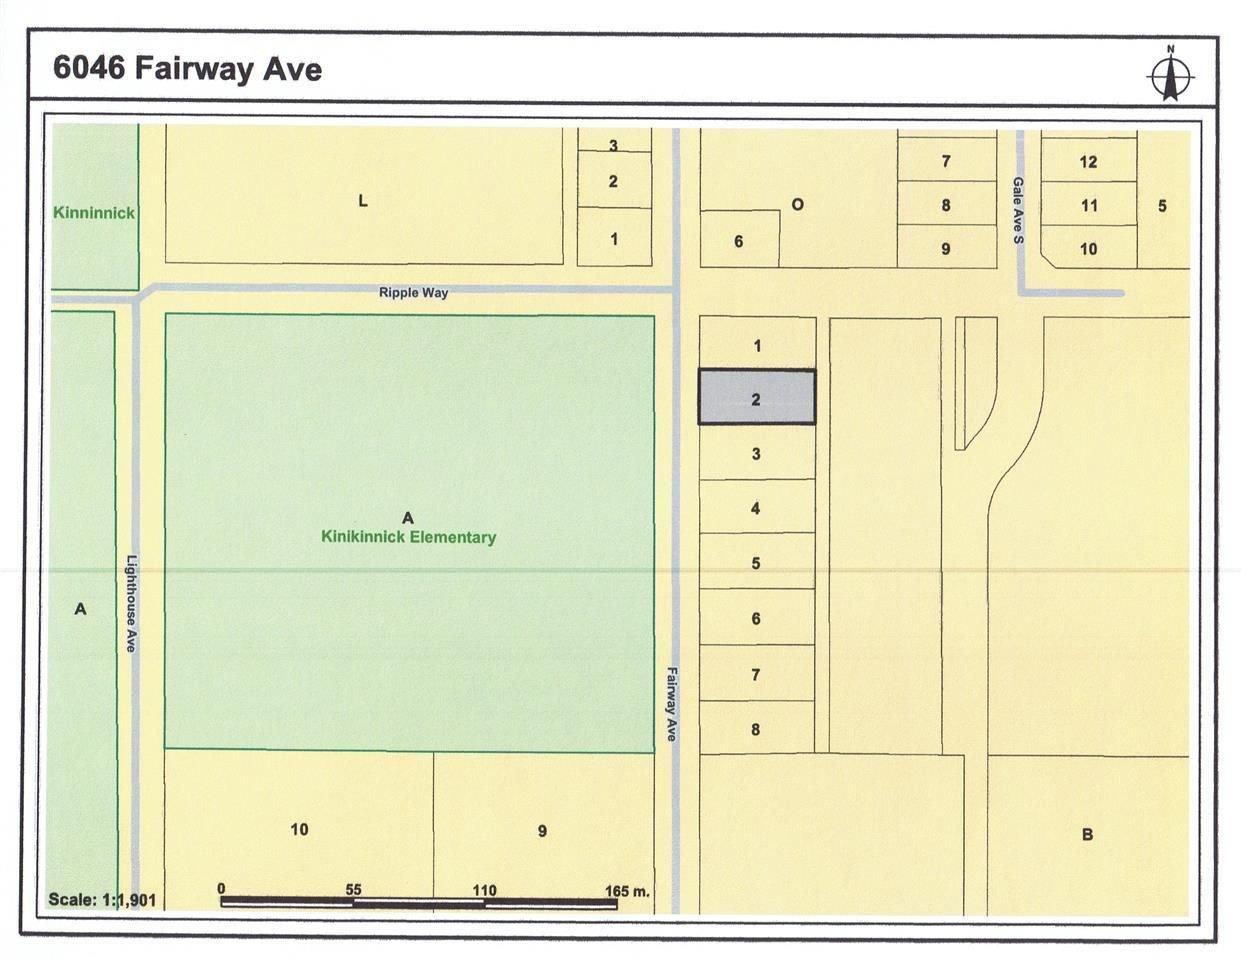 Main Photo: 6046 FAIRWAY Avenue in Sechelt: Sechelt District Land for sale (Sunshine Coast)  : MLS®# R2259631